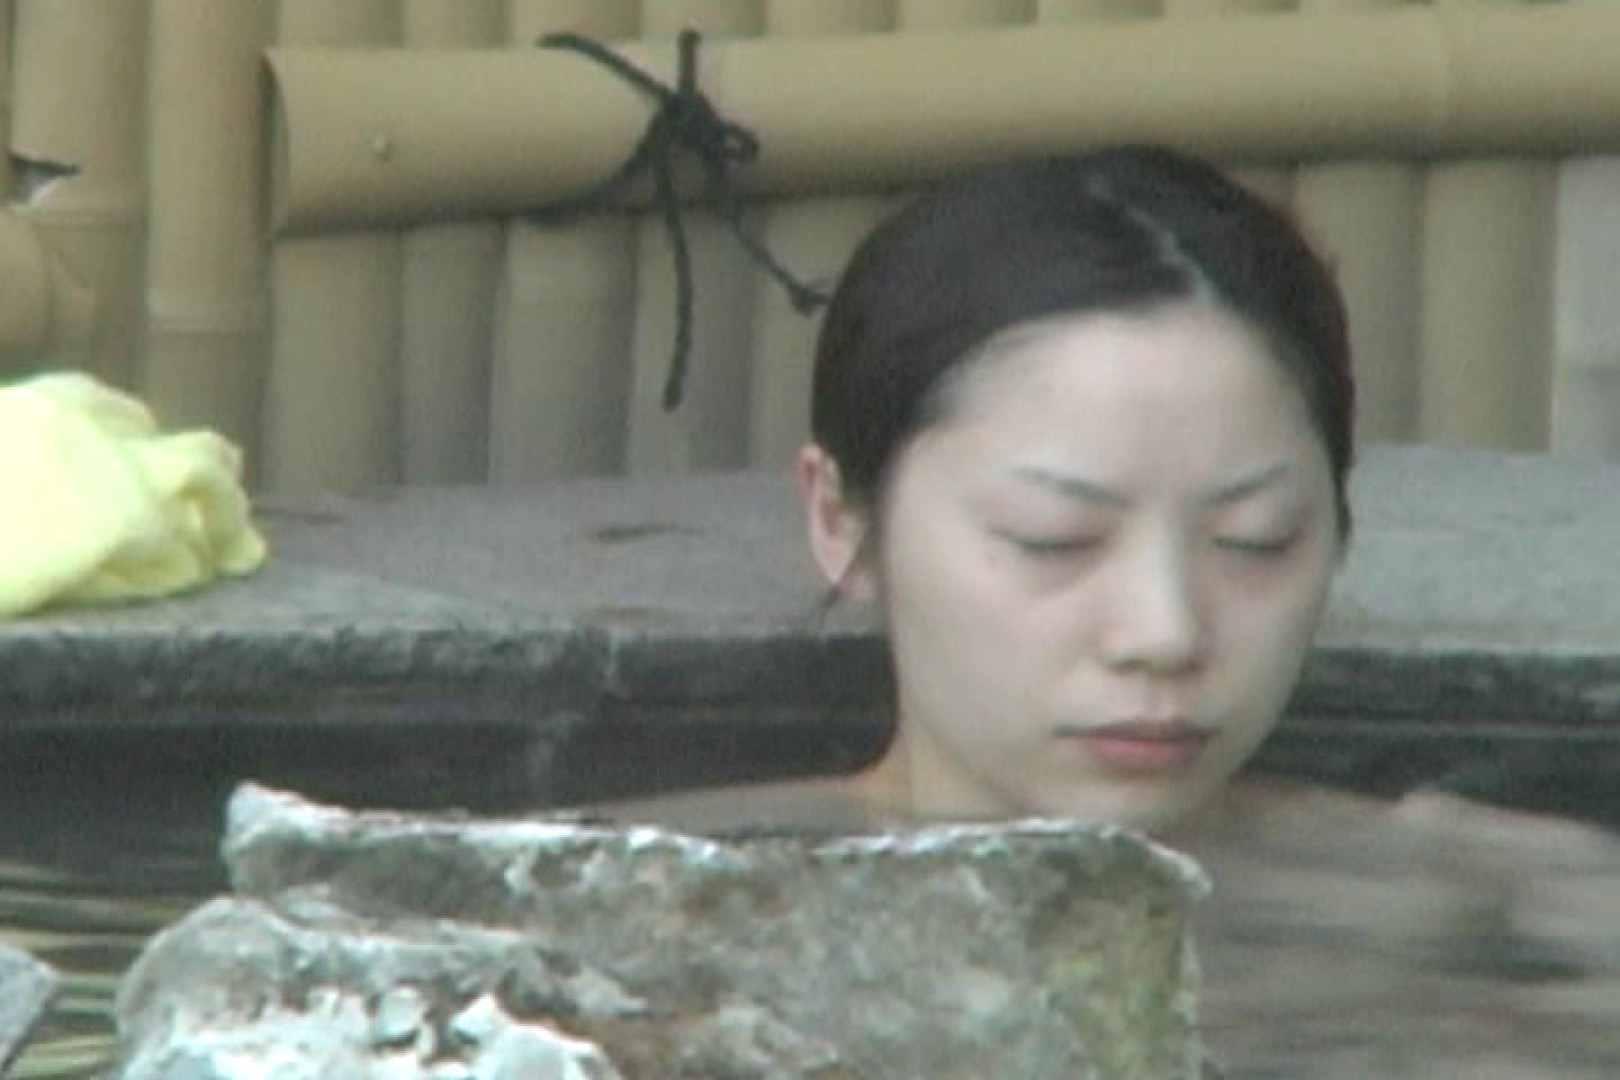 Aquaな露天風呂Vol.596 盗撮シリーズ | 露天風呂編  113PIX 43